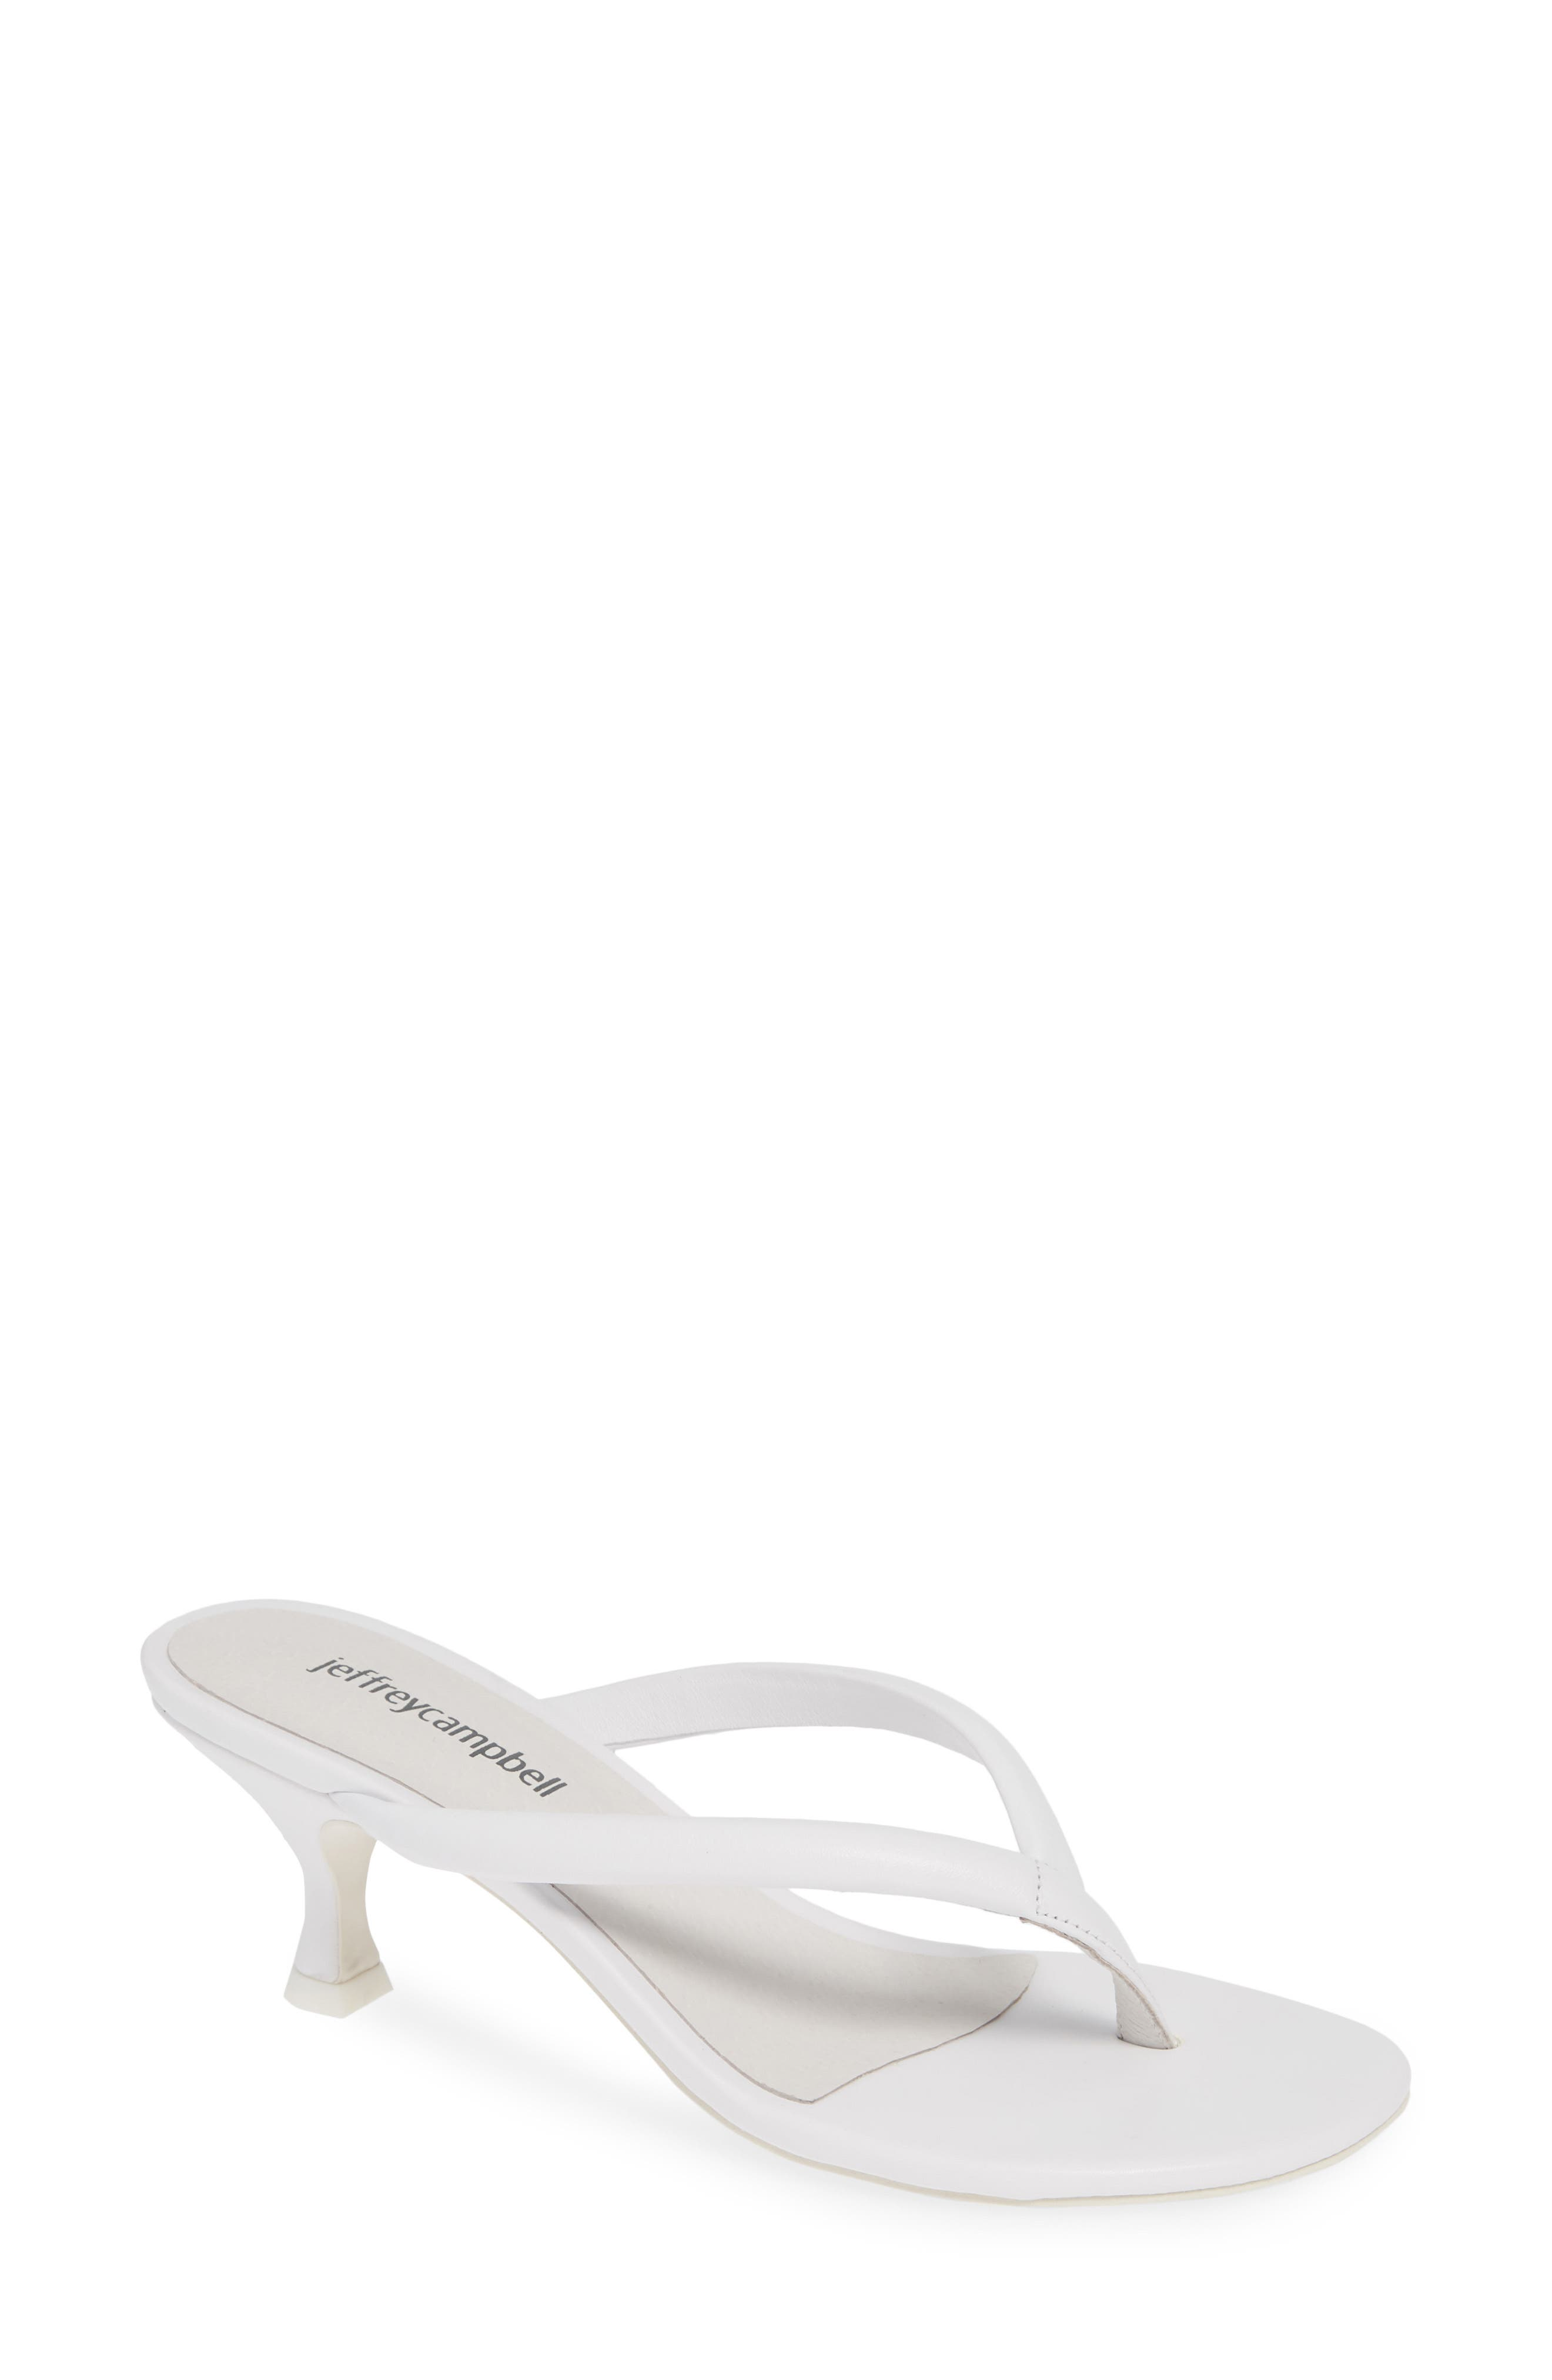 Brink Sandal,                         Main,                         color, WHITE